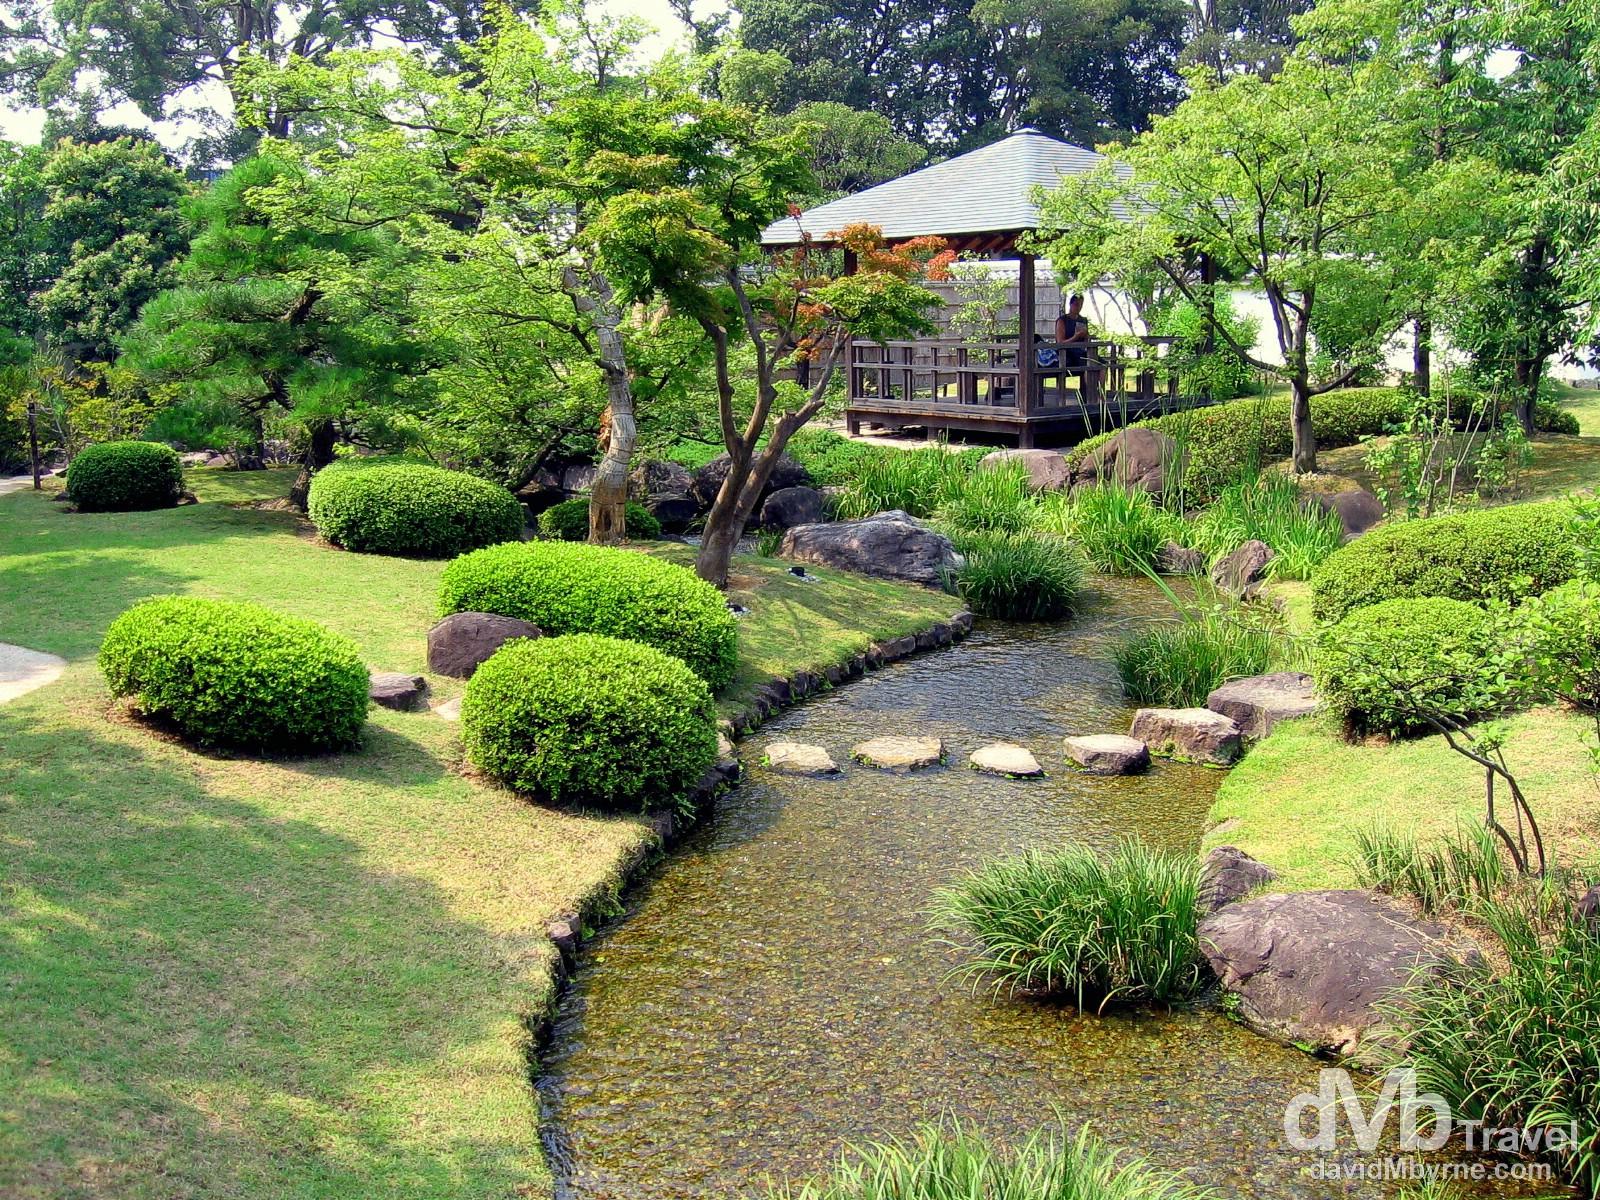 Koko-en Gardens in Himeji, Honshu, Japan. July 21st, 2005.